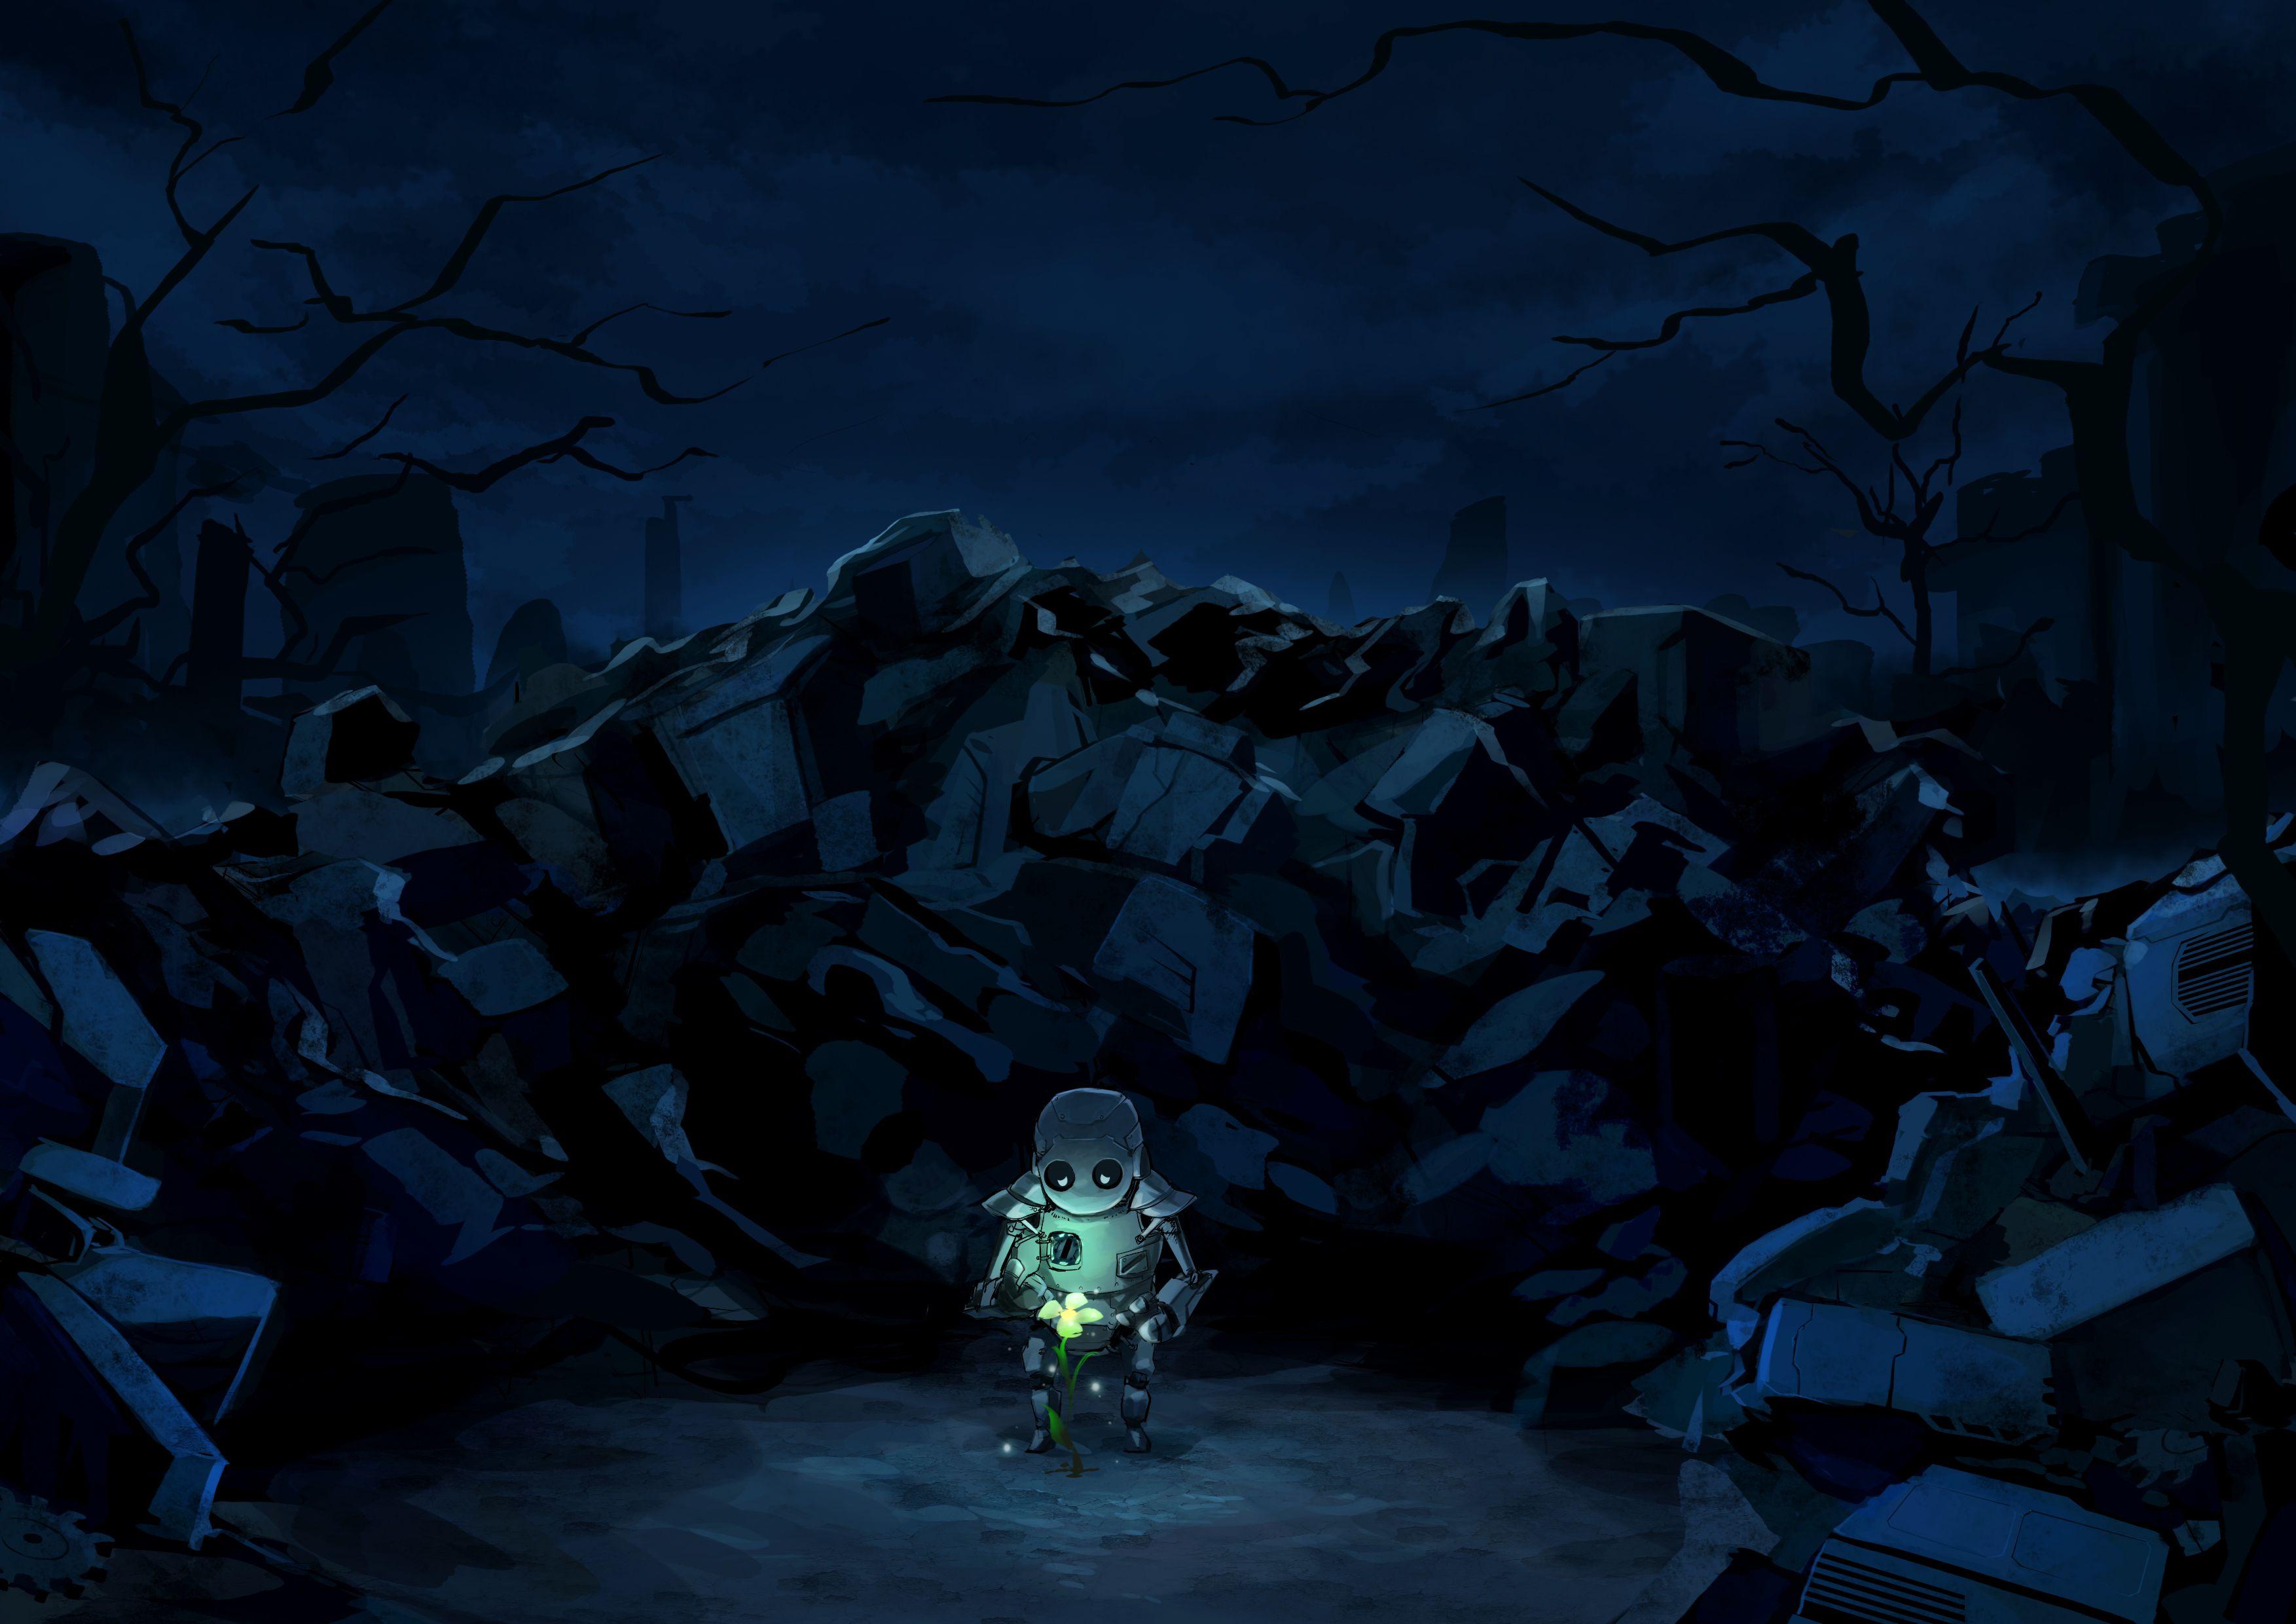 Dark Anime Scenery Wallpaper Desktop Background Scenery